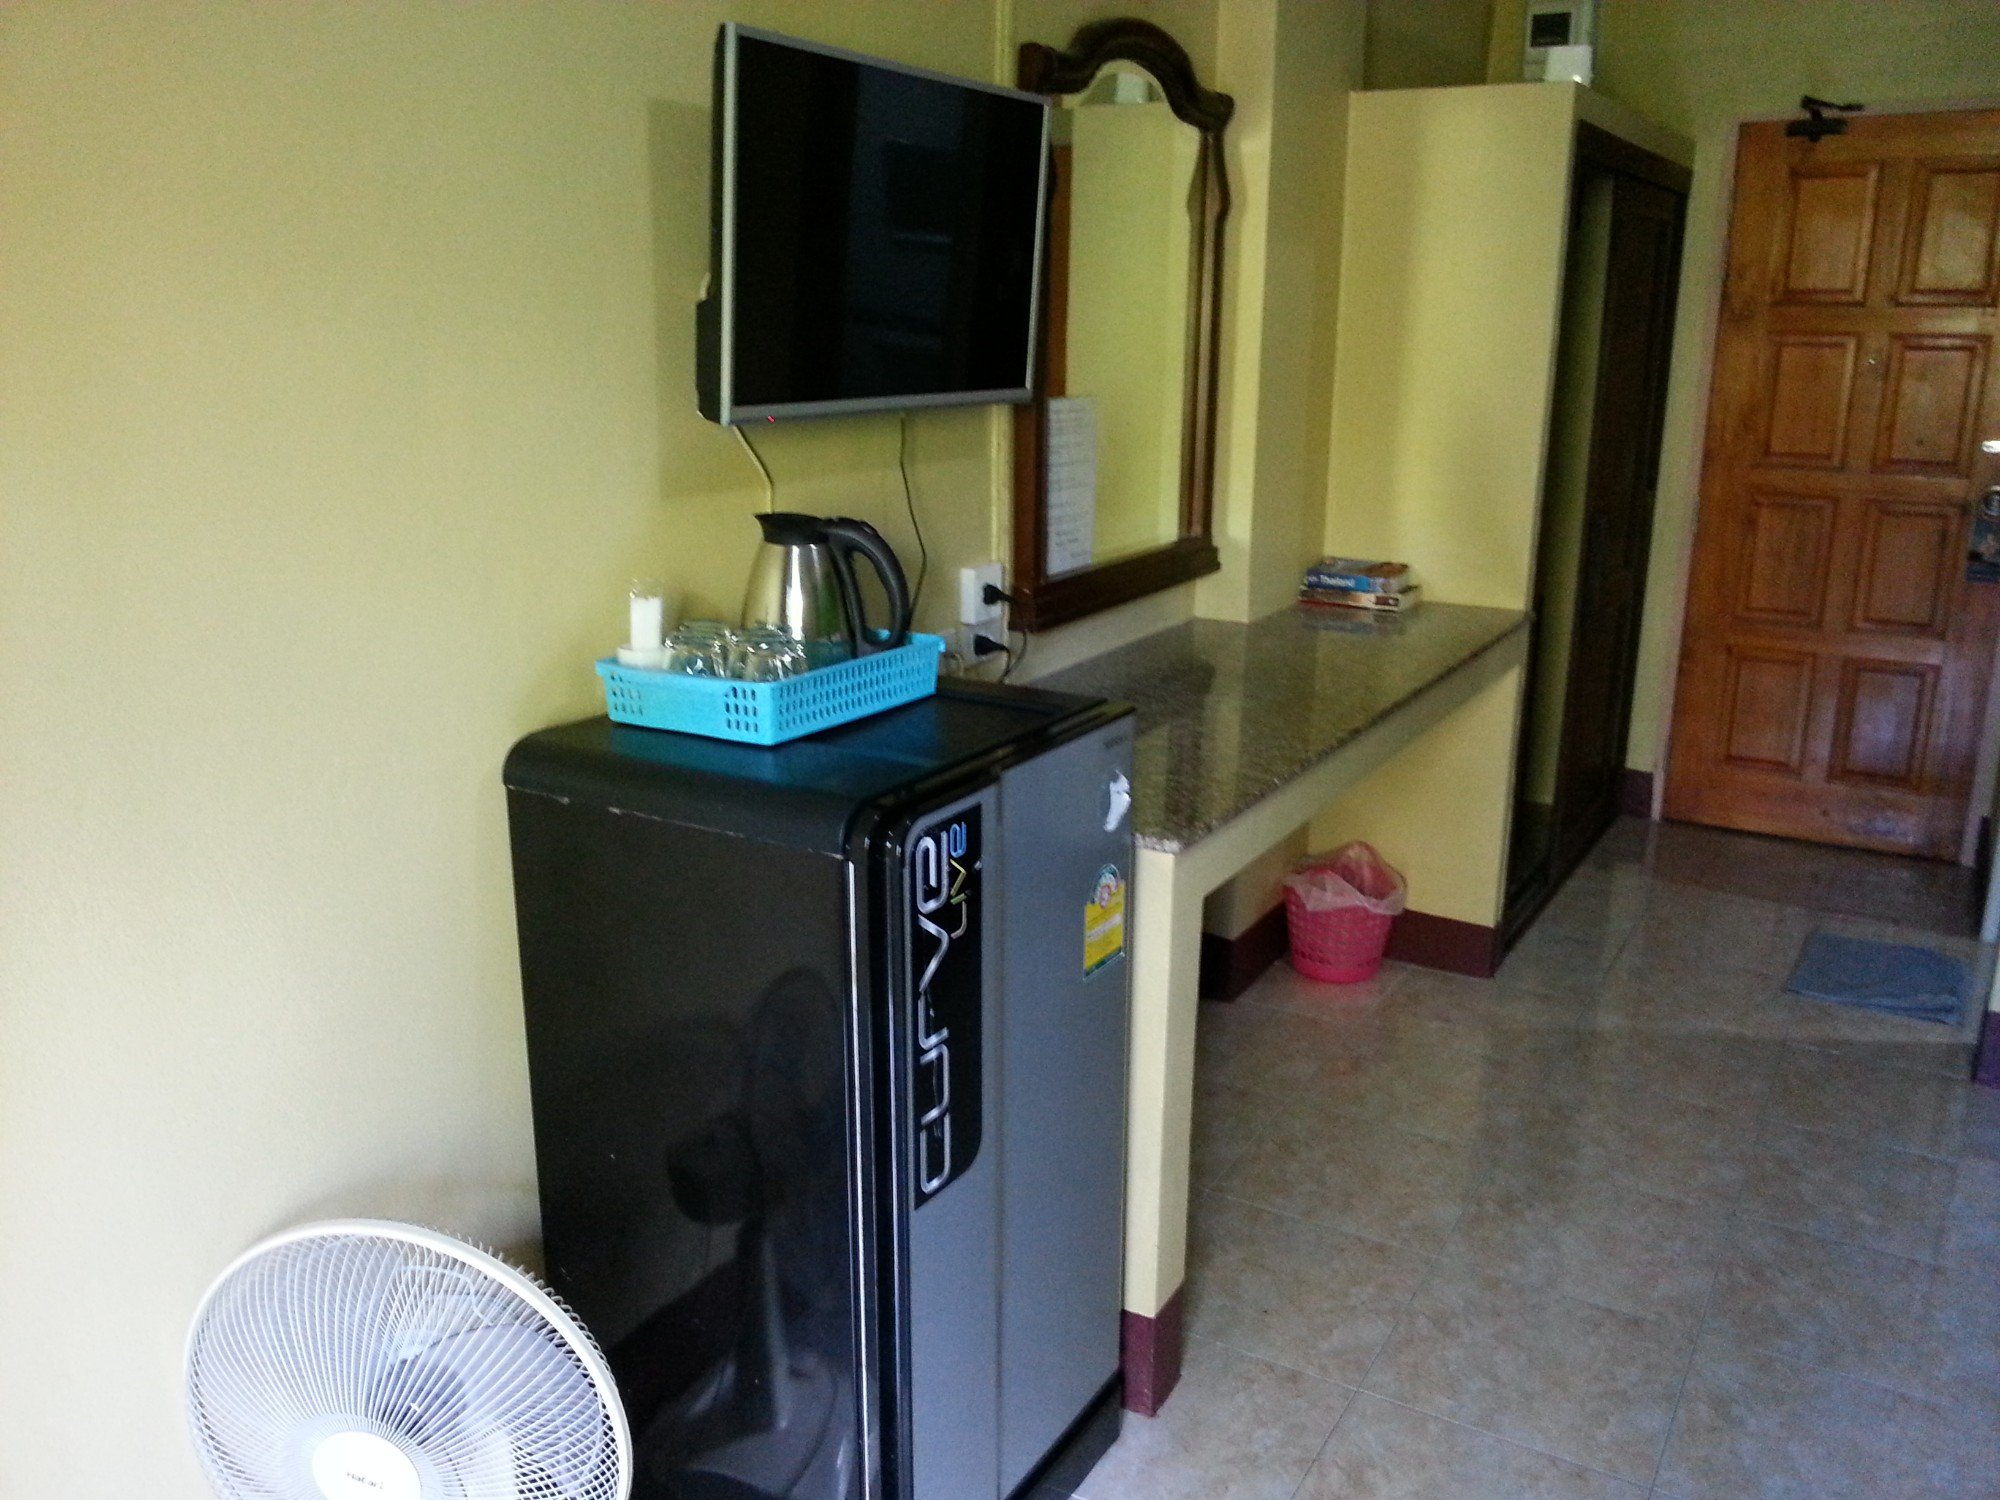 Room facilities at the Ban Punmanus Guesthouse